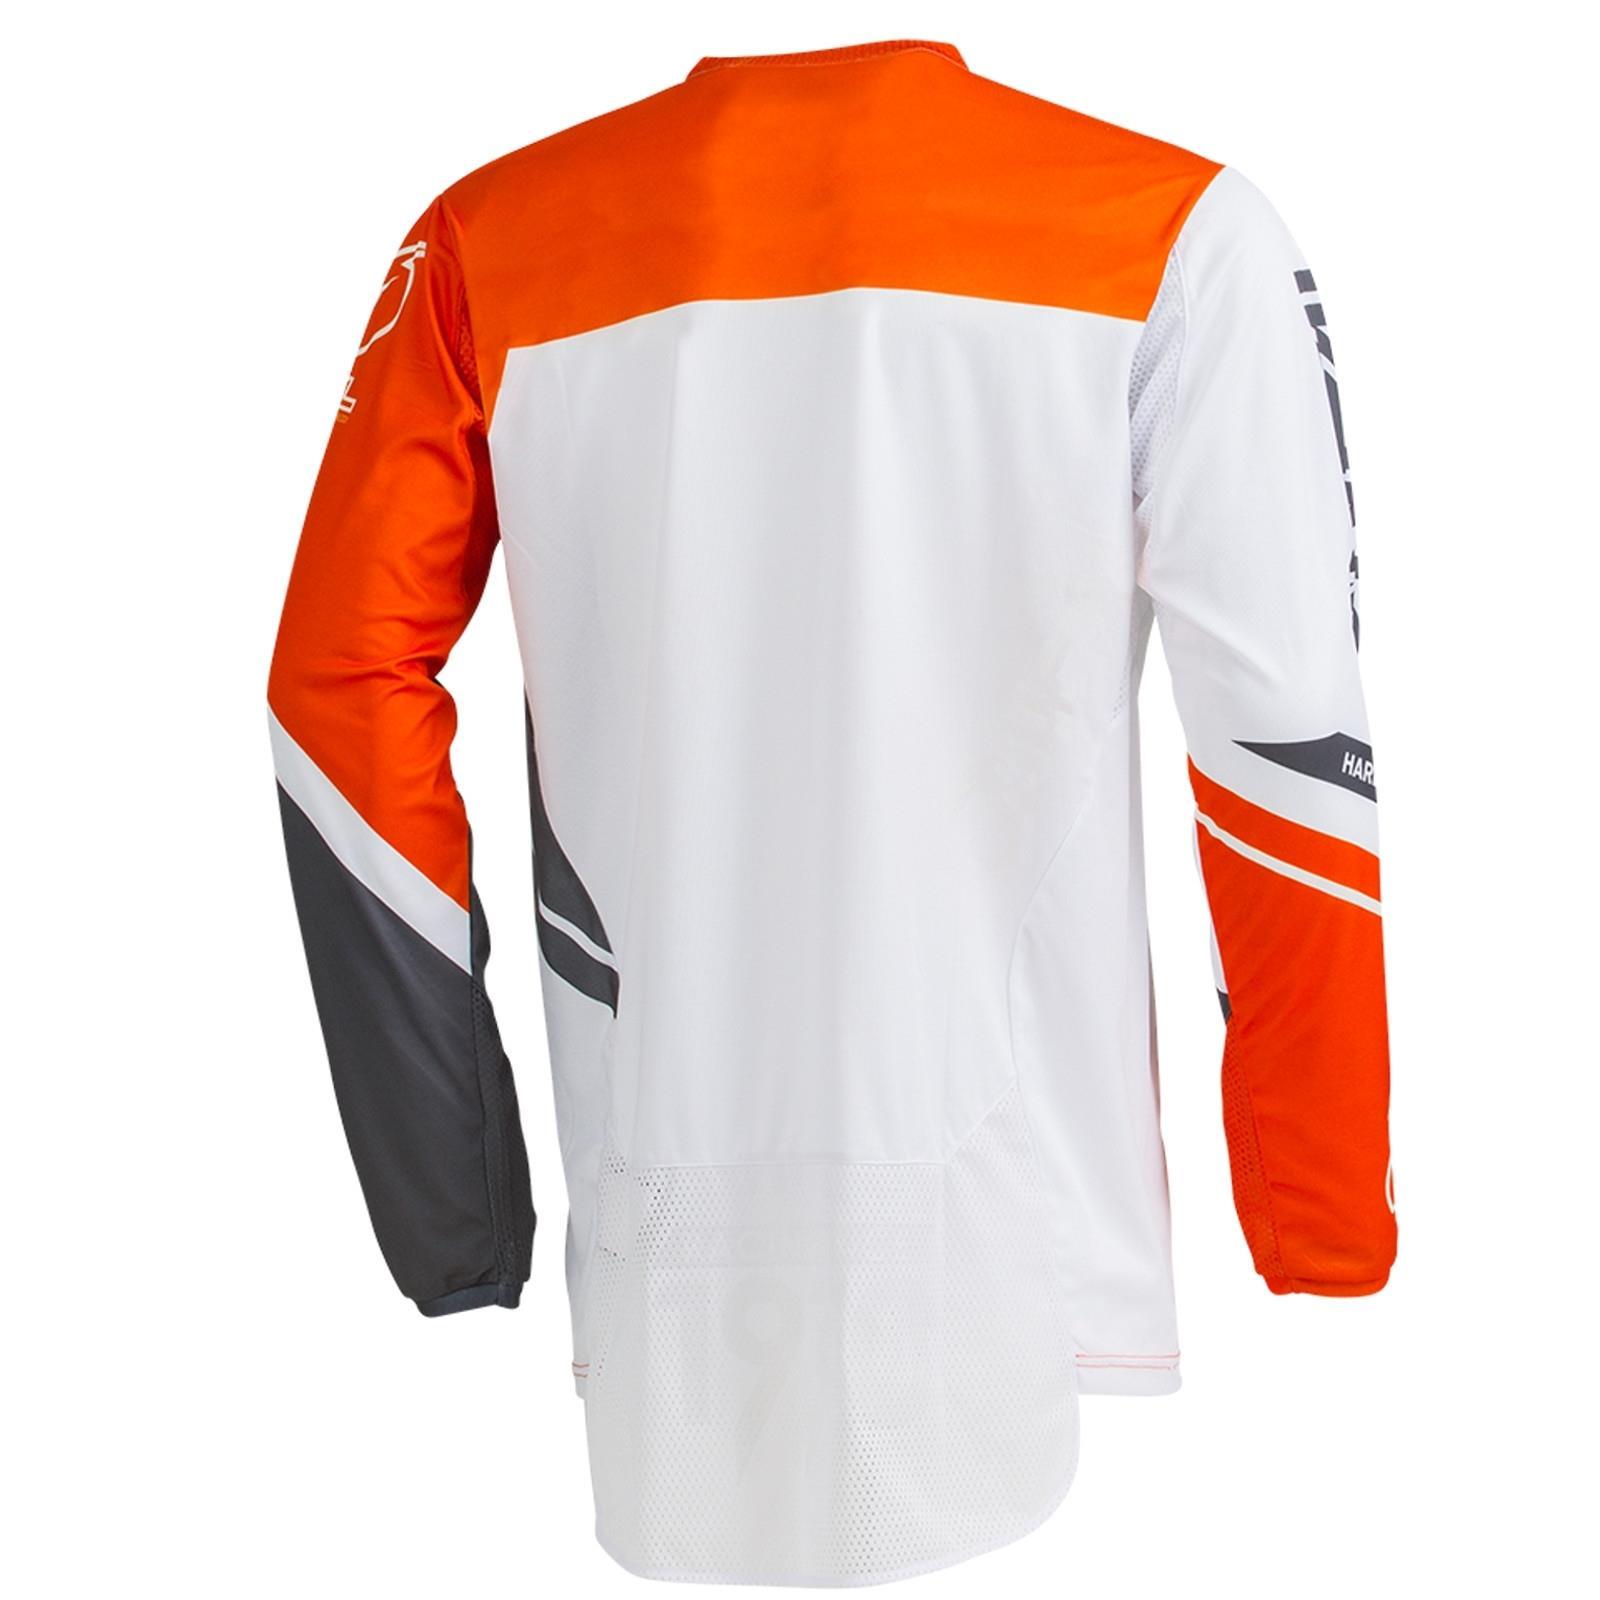 O-039-Neal-elemento-Mayhem-JERSEY-Racewear-Motocross-Maglia-MX-DH-FR-MTB-MOUNTAIN-BIKE miniatura 24